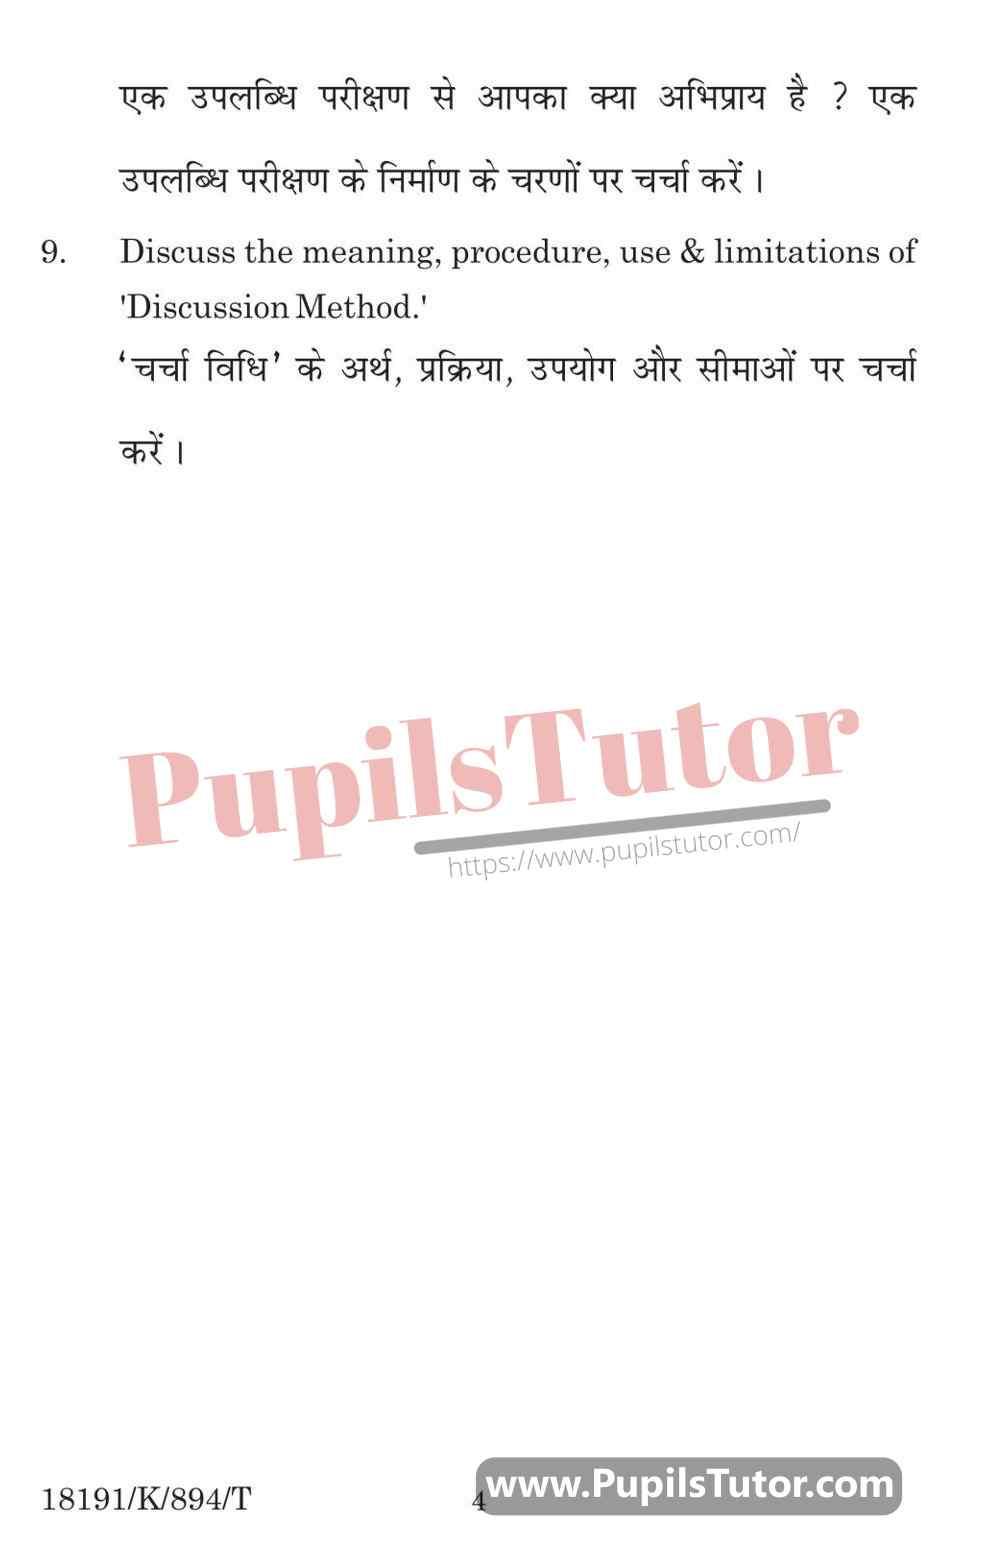 KUK (Kurukshetra University, Haryana) Pedagogy Of Economics Question Paper 2020 For B.Ed 1st And 2nd Year And All The 4 Semesters In English And Hindi Medium Free Download PDF - Page 4 - pupilstutor